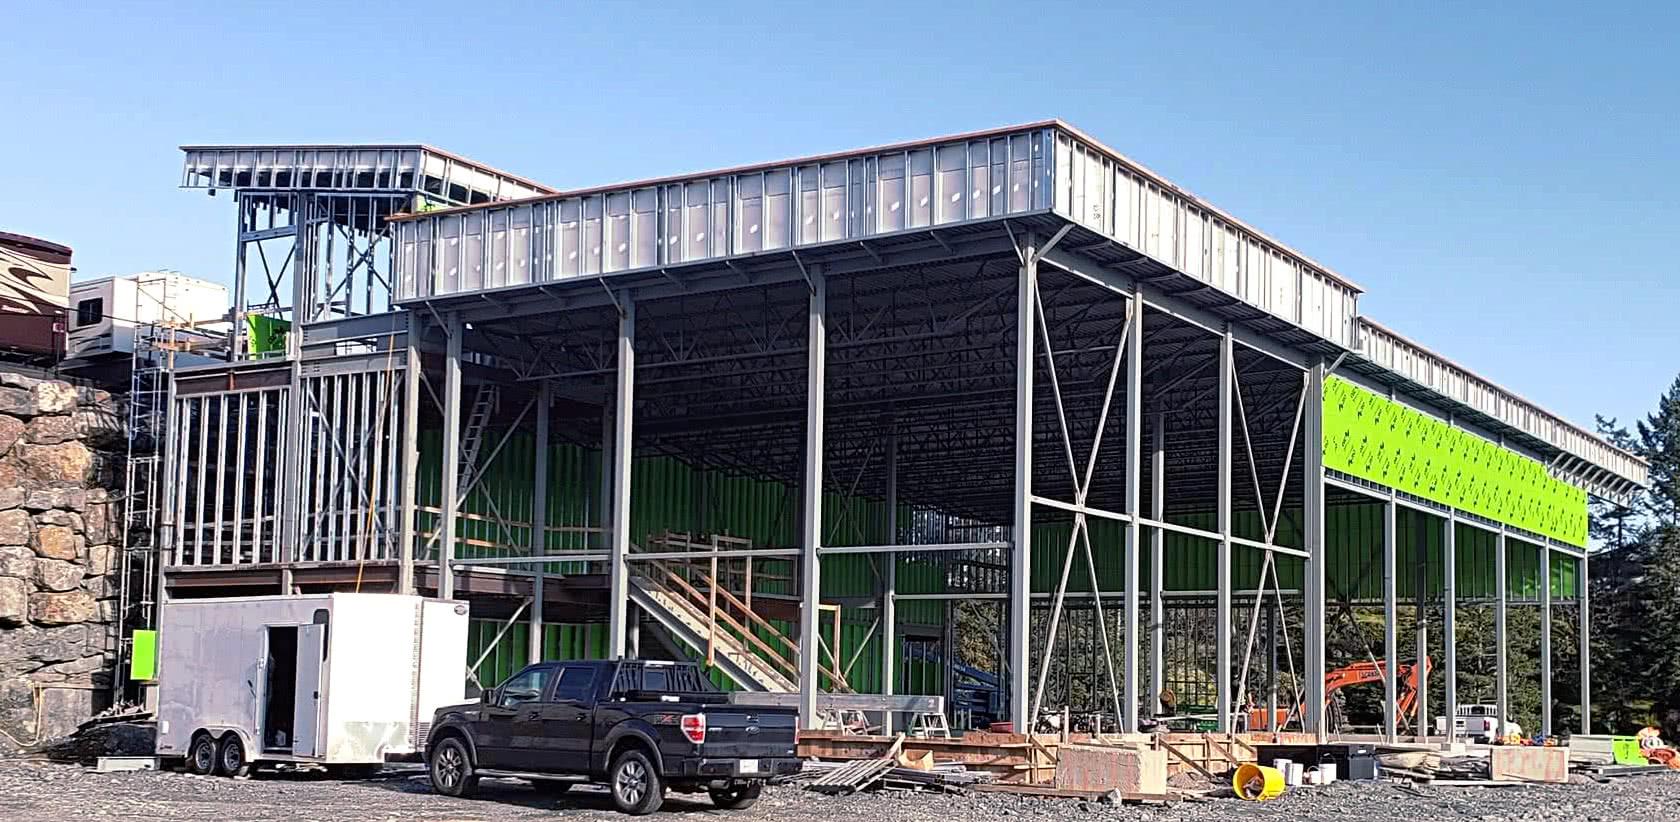 victoria_rv_dealership_under_construction_side